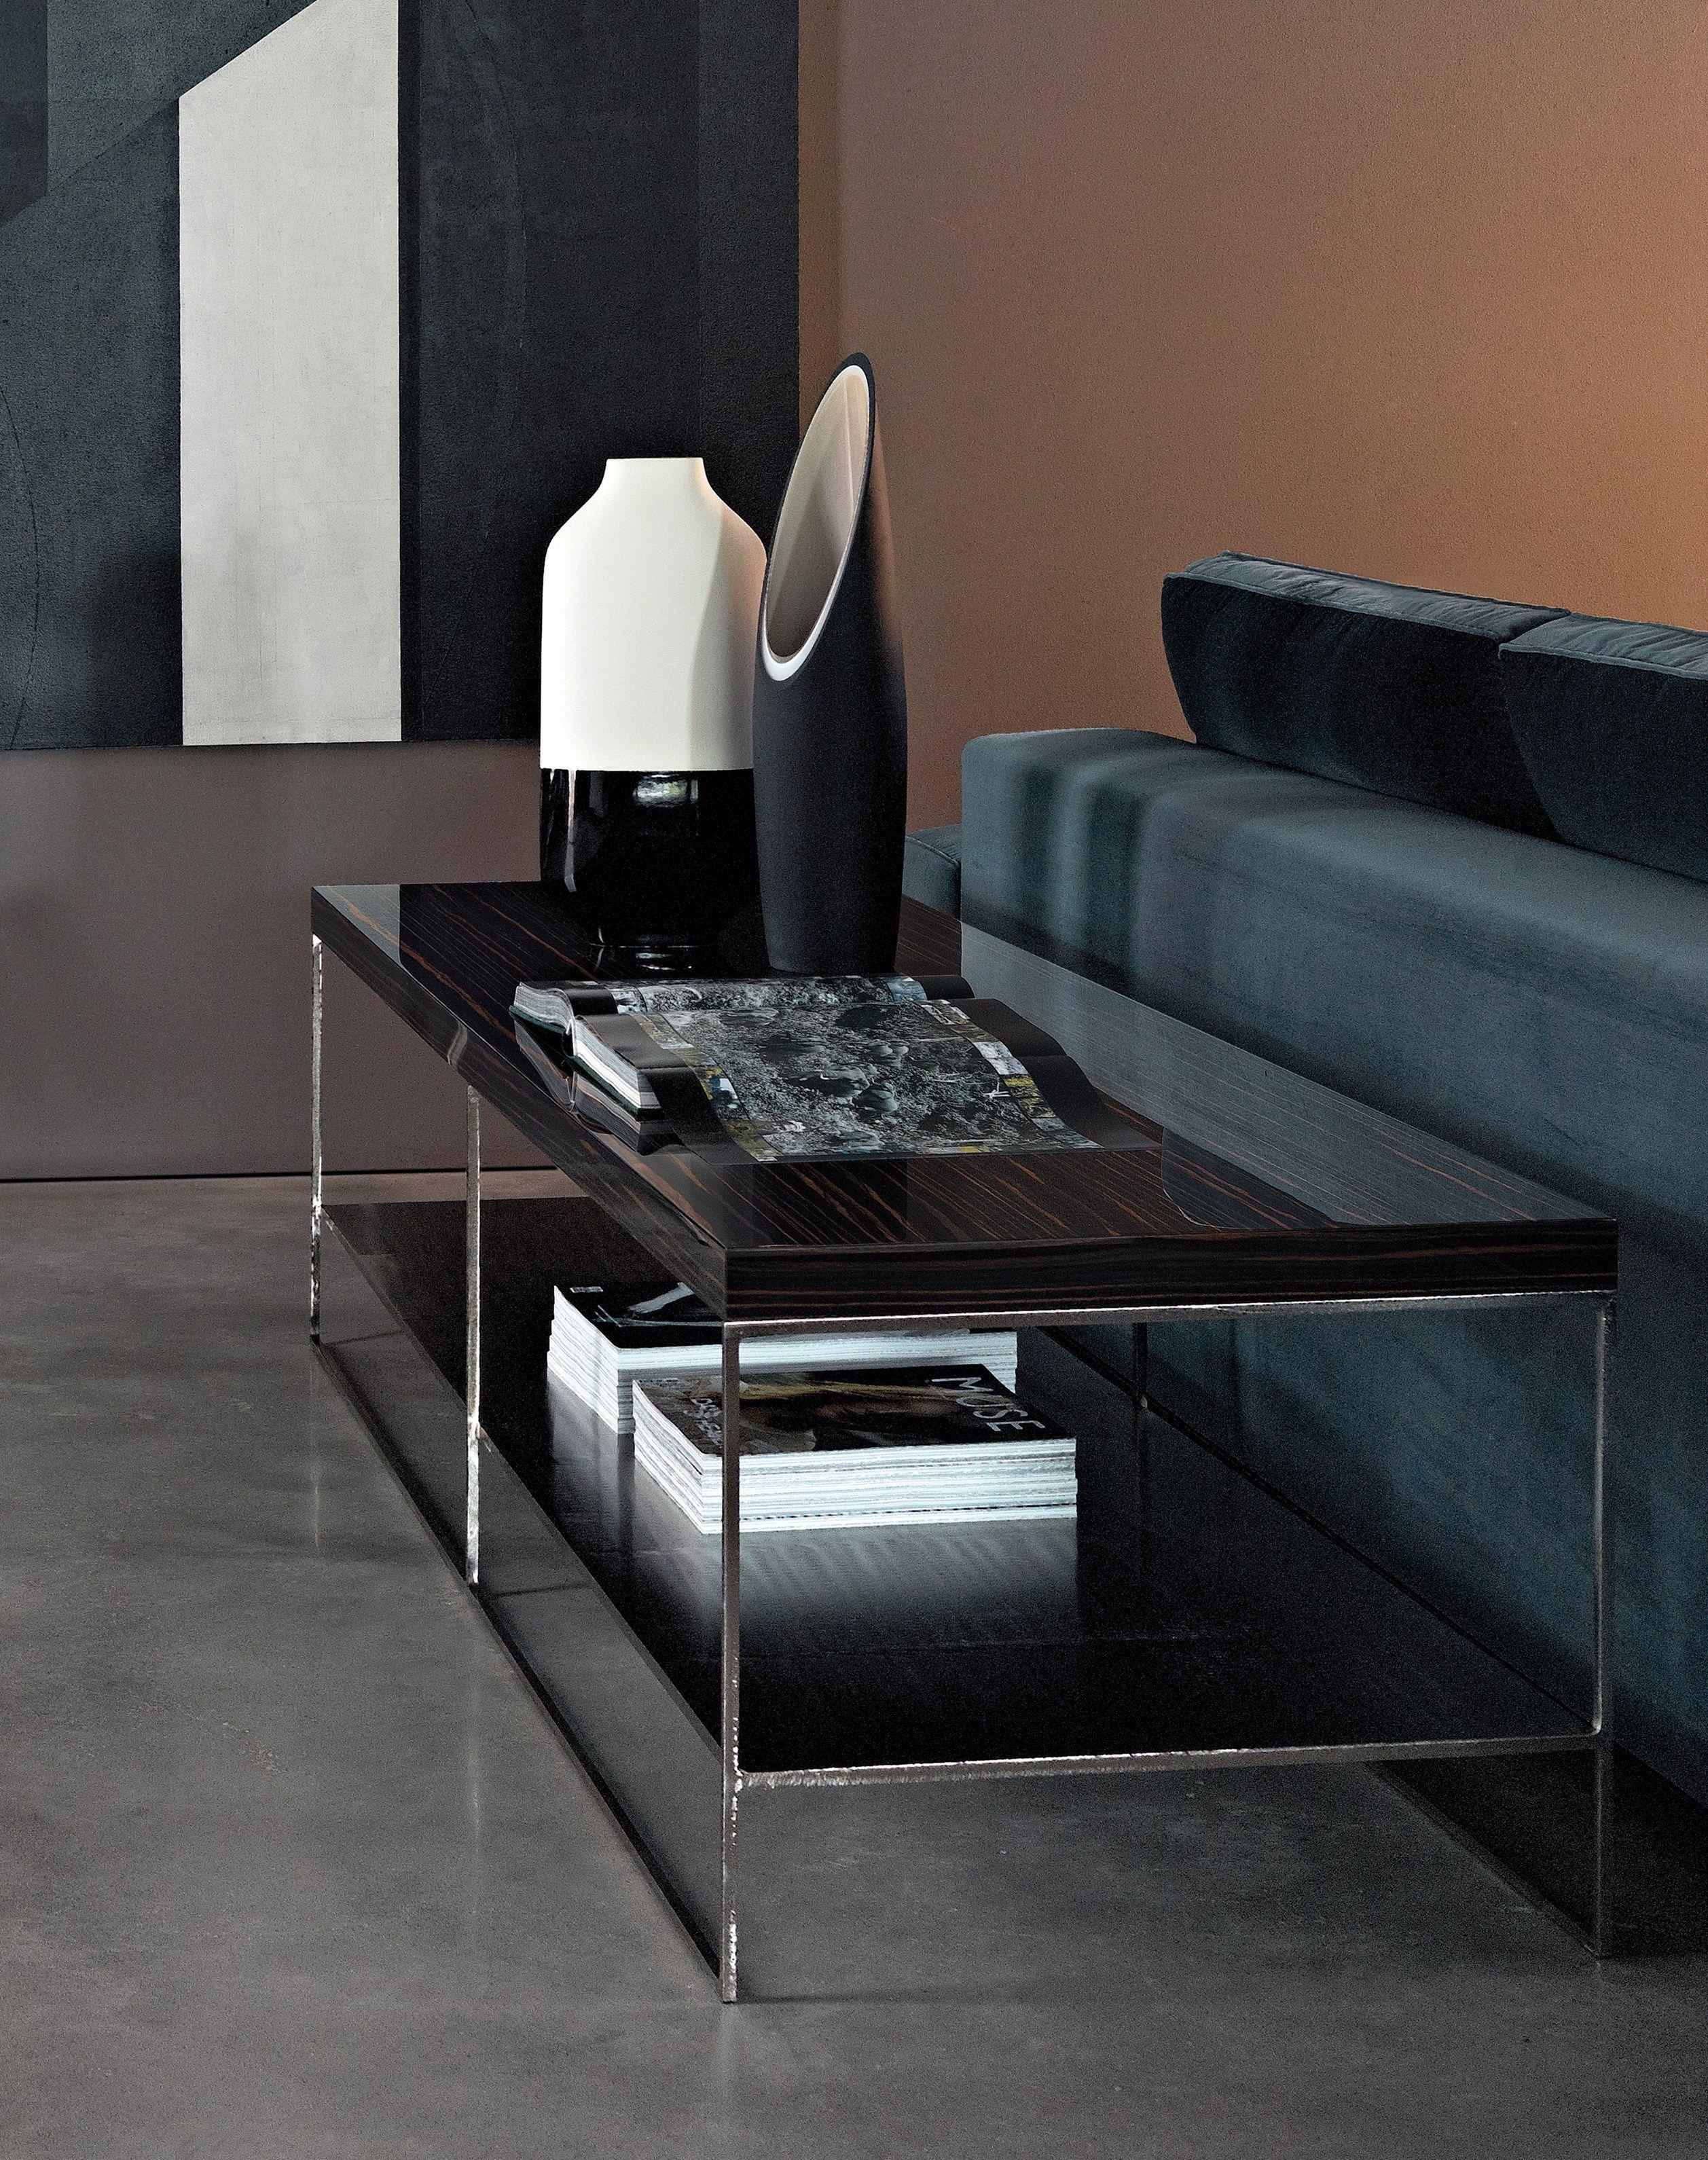 calder couchtisch by minotti. Black Bedroom Furniture Sets. Home Design Ideas